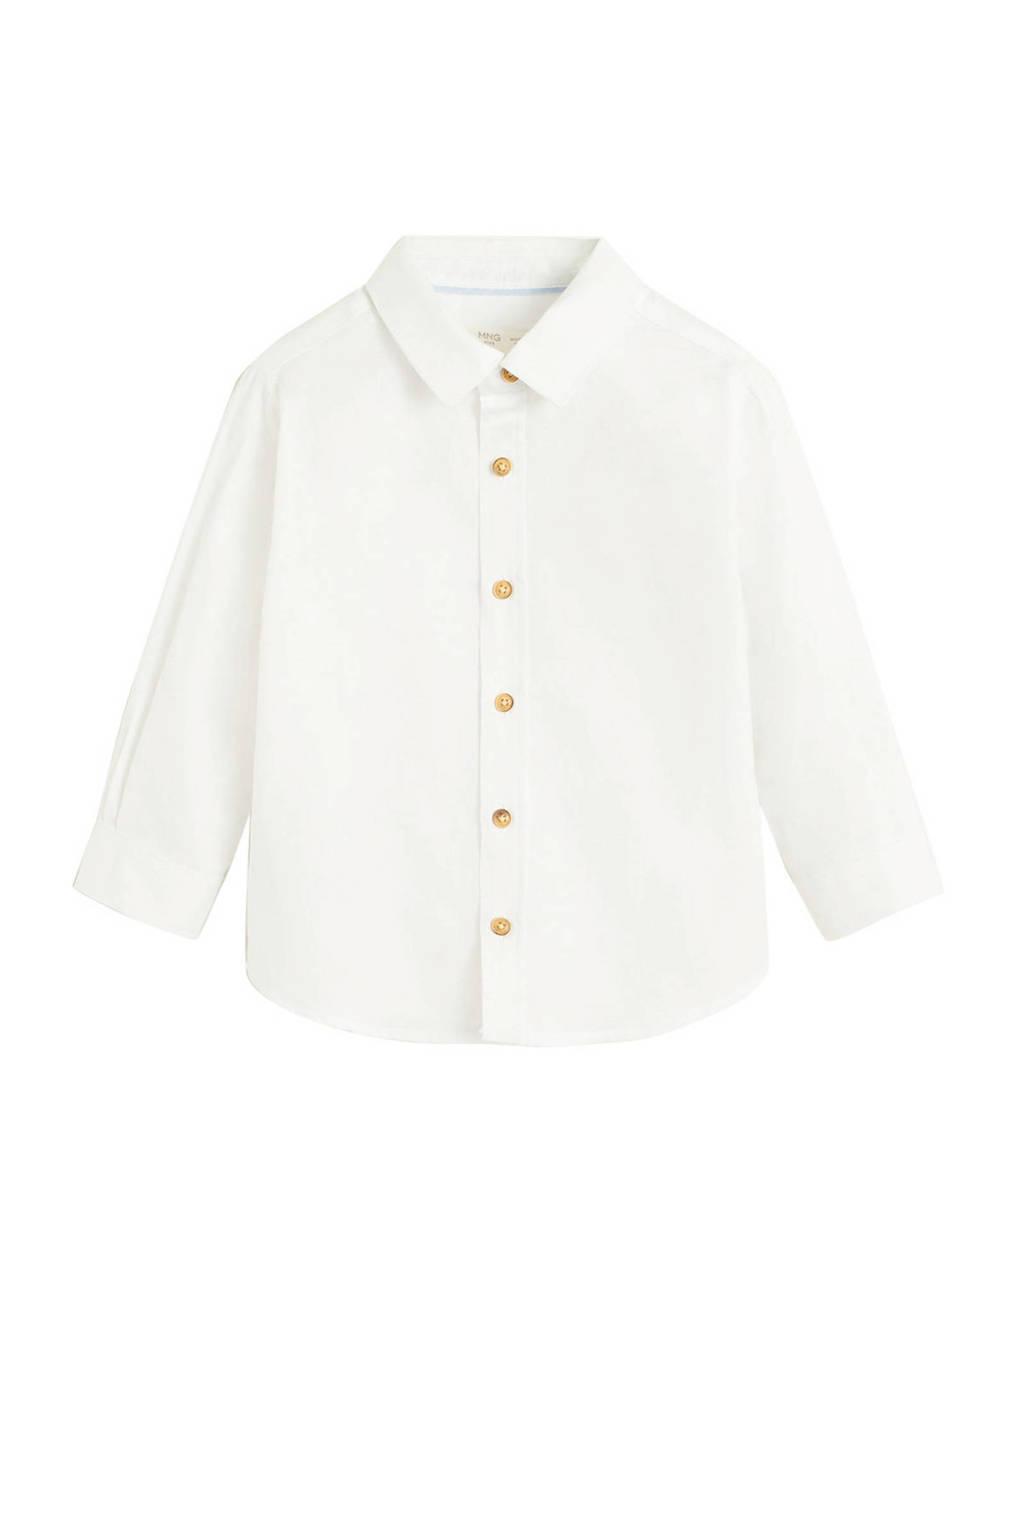 Mango Kids overhemd offwhite, Offwhite